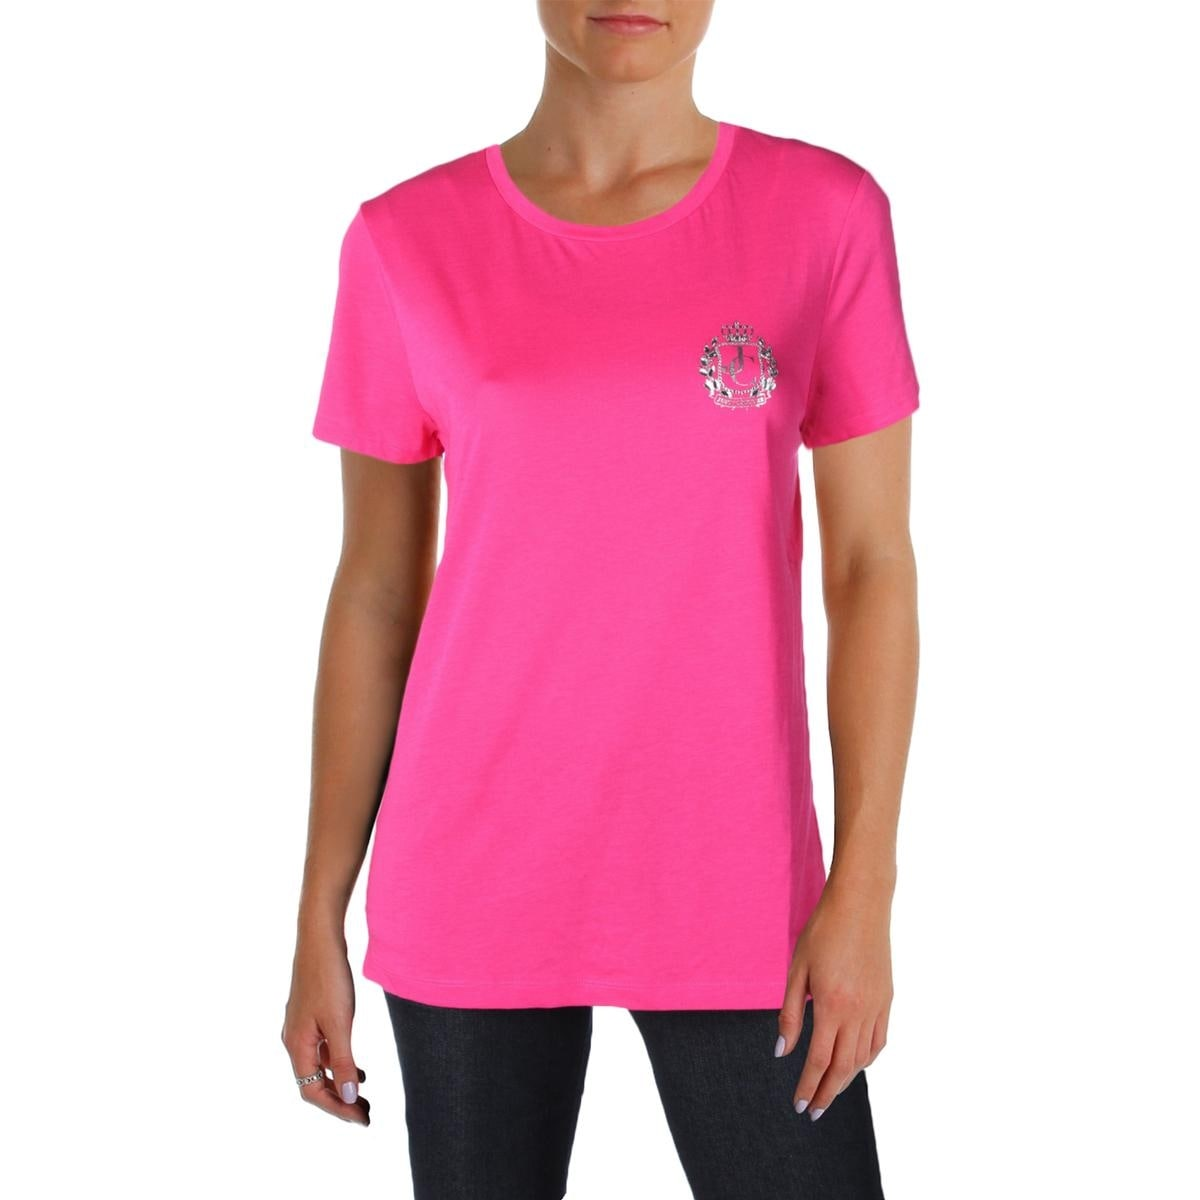 e774b3fae Shop Juicy Couture Black Label Womens T-Shirt Crewneck Logo - Free ...